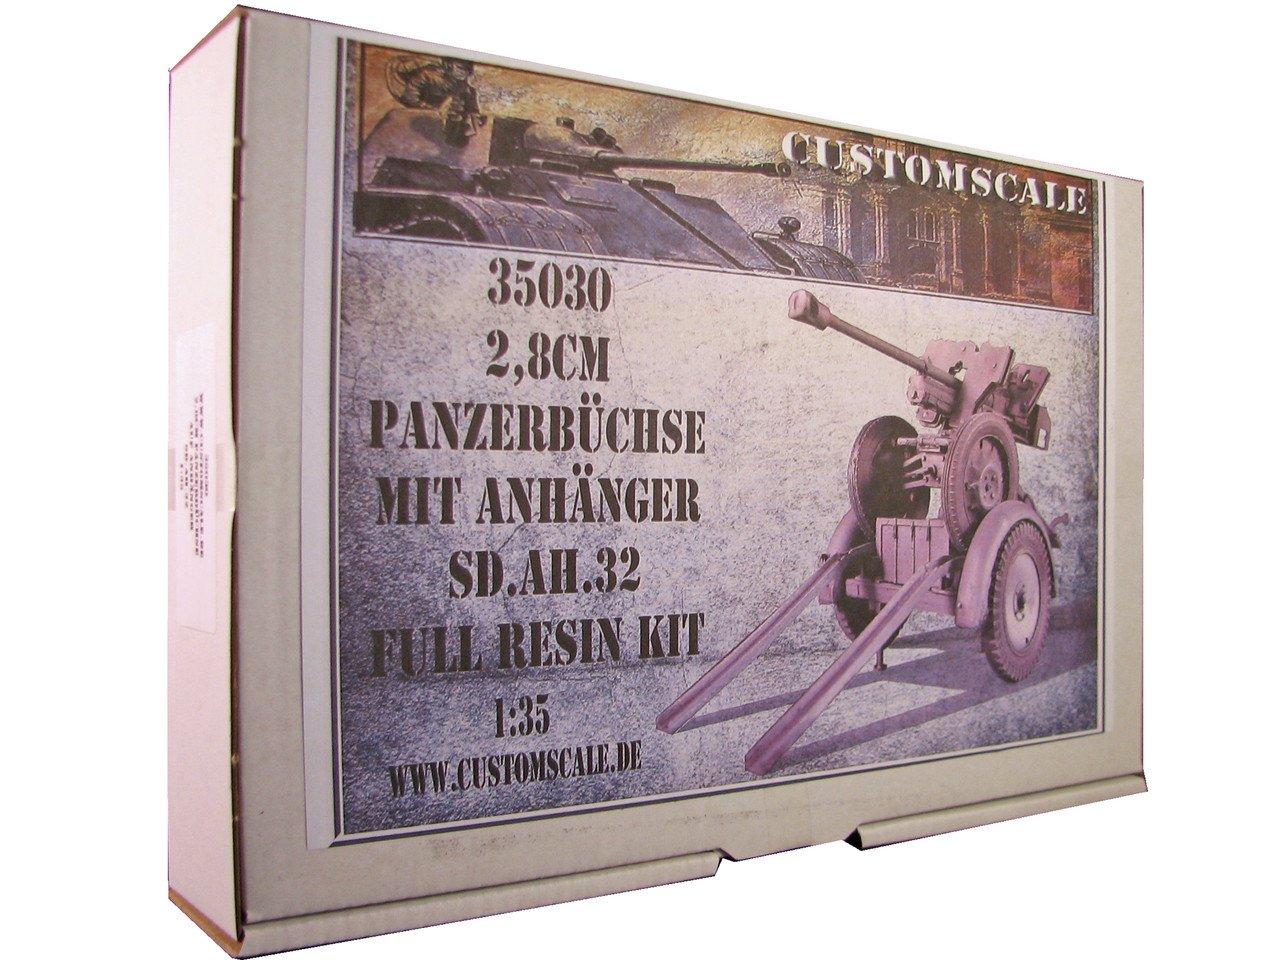 customscale 1 : 35 2.8 CM panzerbuchse 41 onトレーラーSD。Ah。32樹脂キット# 35030 B01JRJT8LG